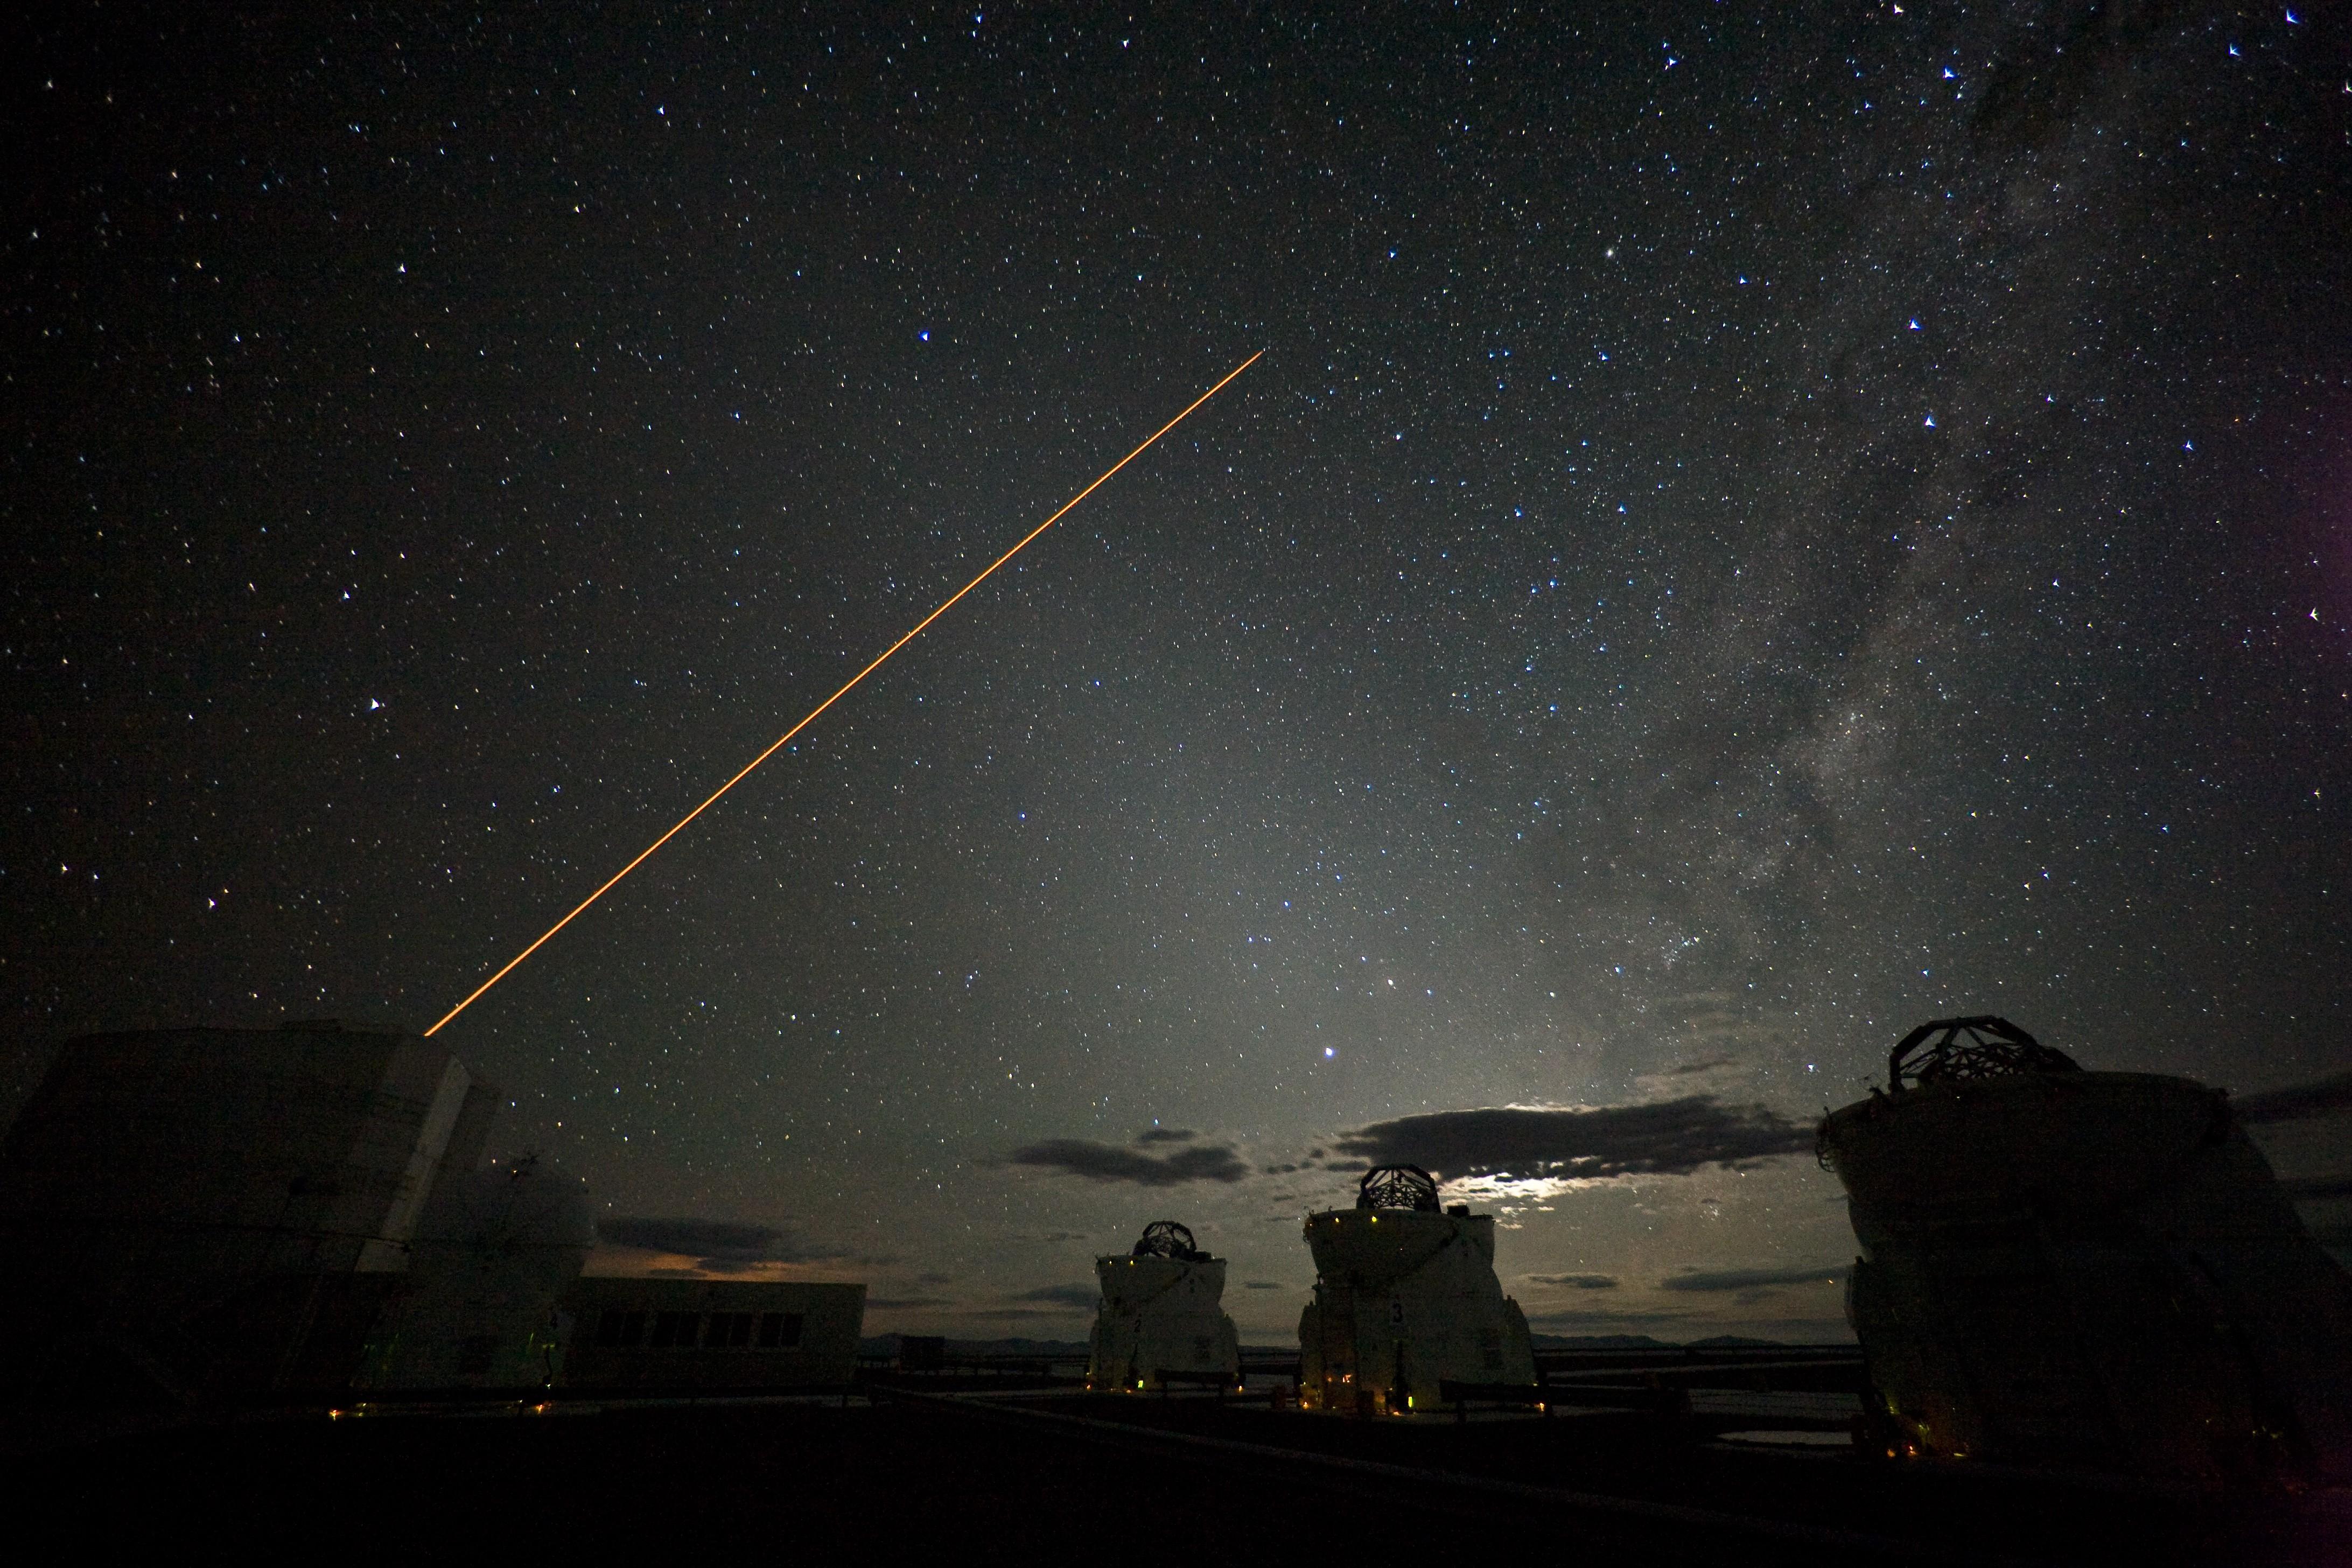 VLT vasculha os céus do deserto do Atacama (Foto: ESO/H.H.Heyer)